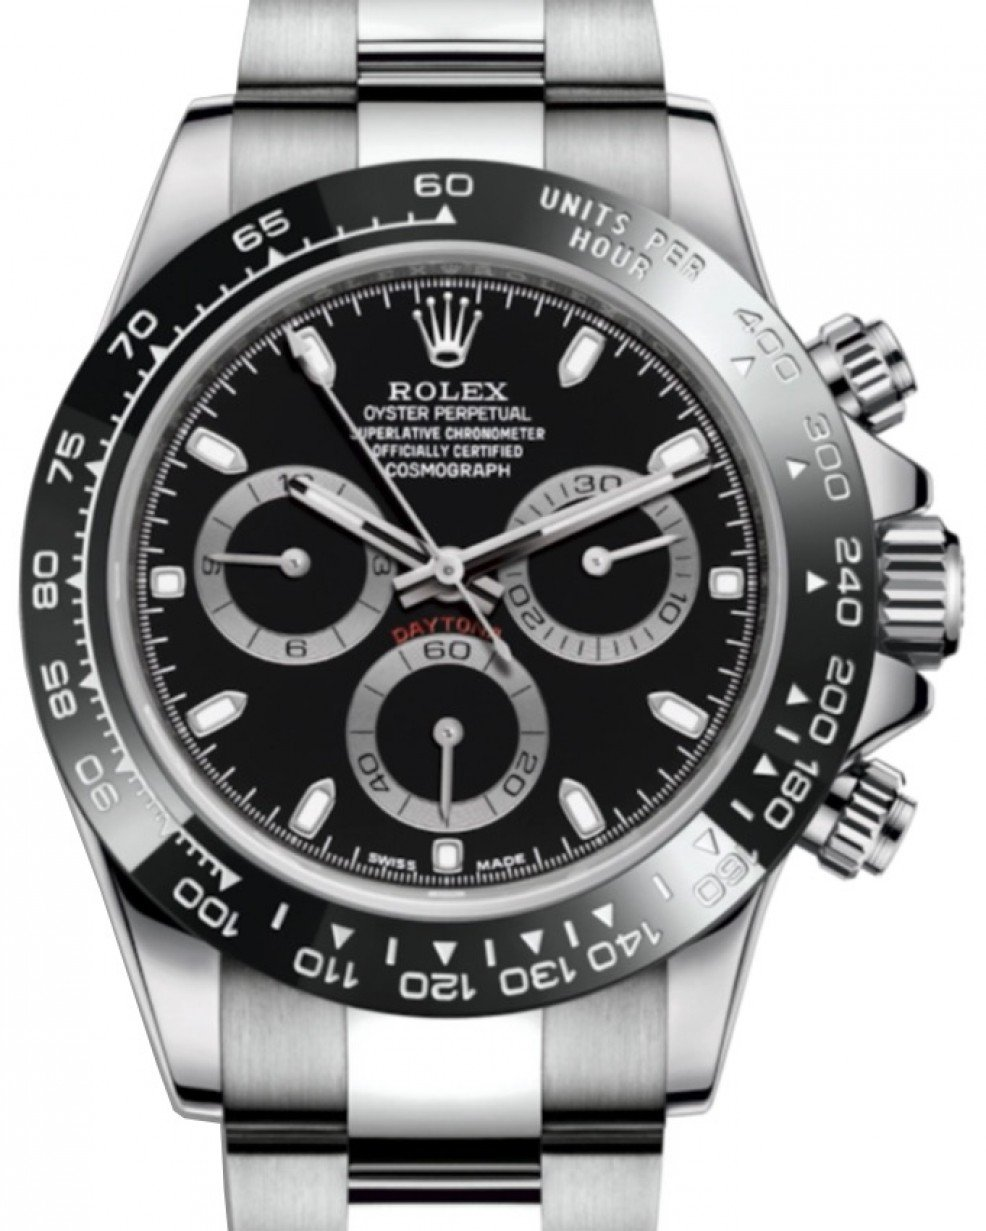 953cc601dccf5 Rolex Cosmograph Daytona 116500LN 116500 40mm Black Cerachrom Black ...